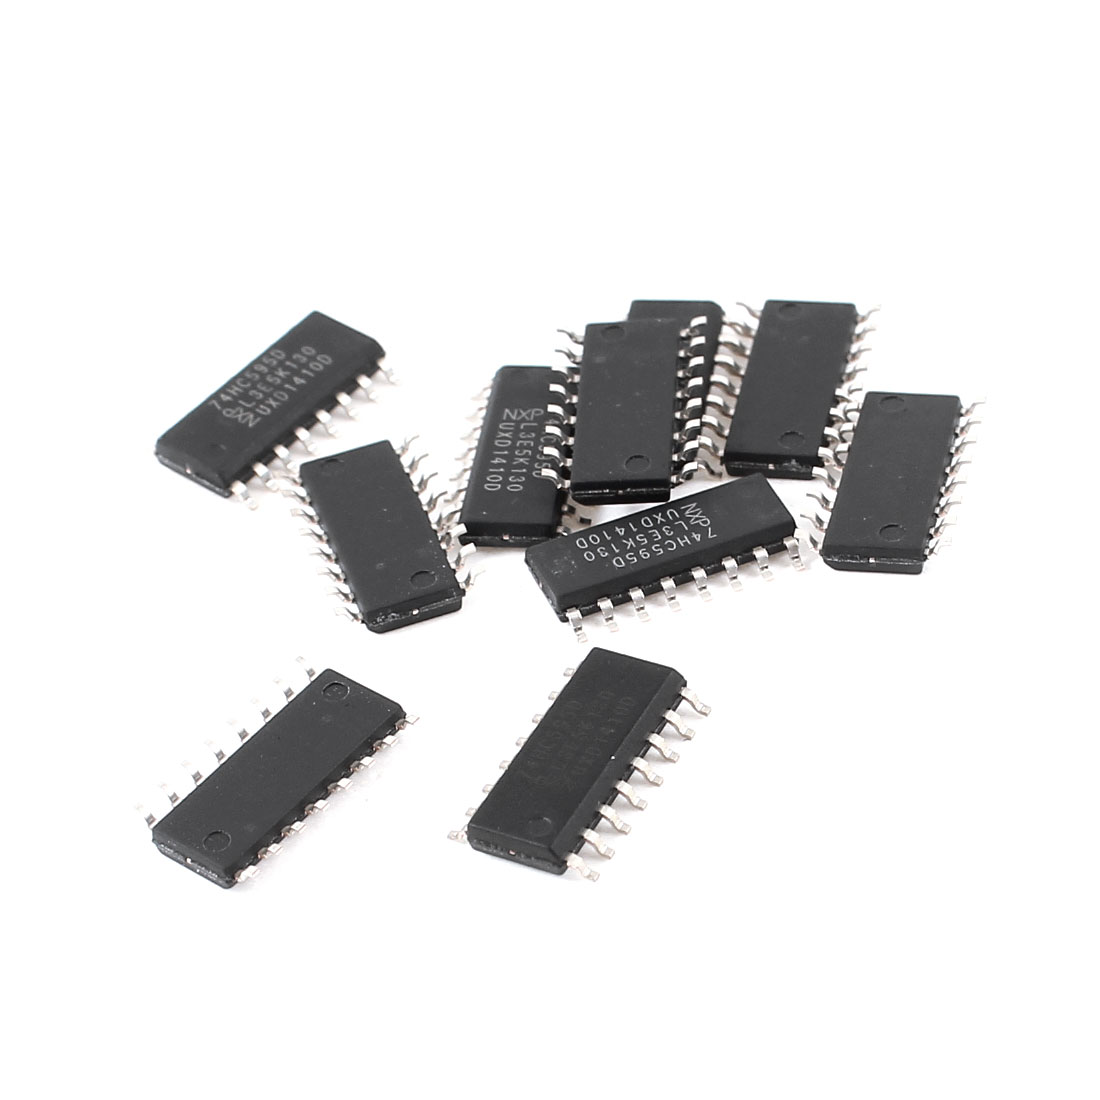 10 Pcs 74HC595D Electronic SMD 4mm SOP-16 8-Bit Latch Shift Register